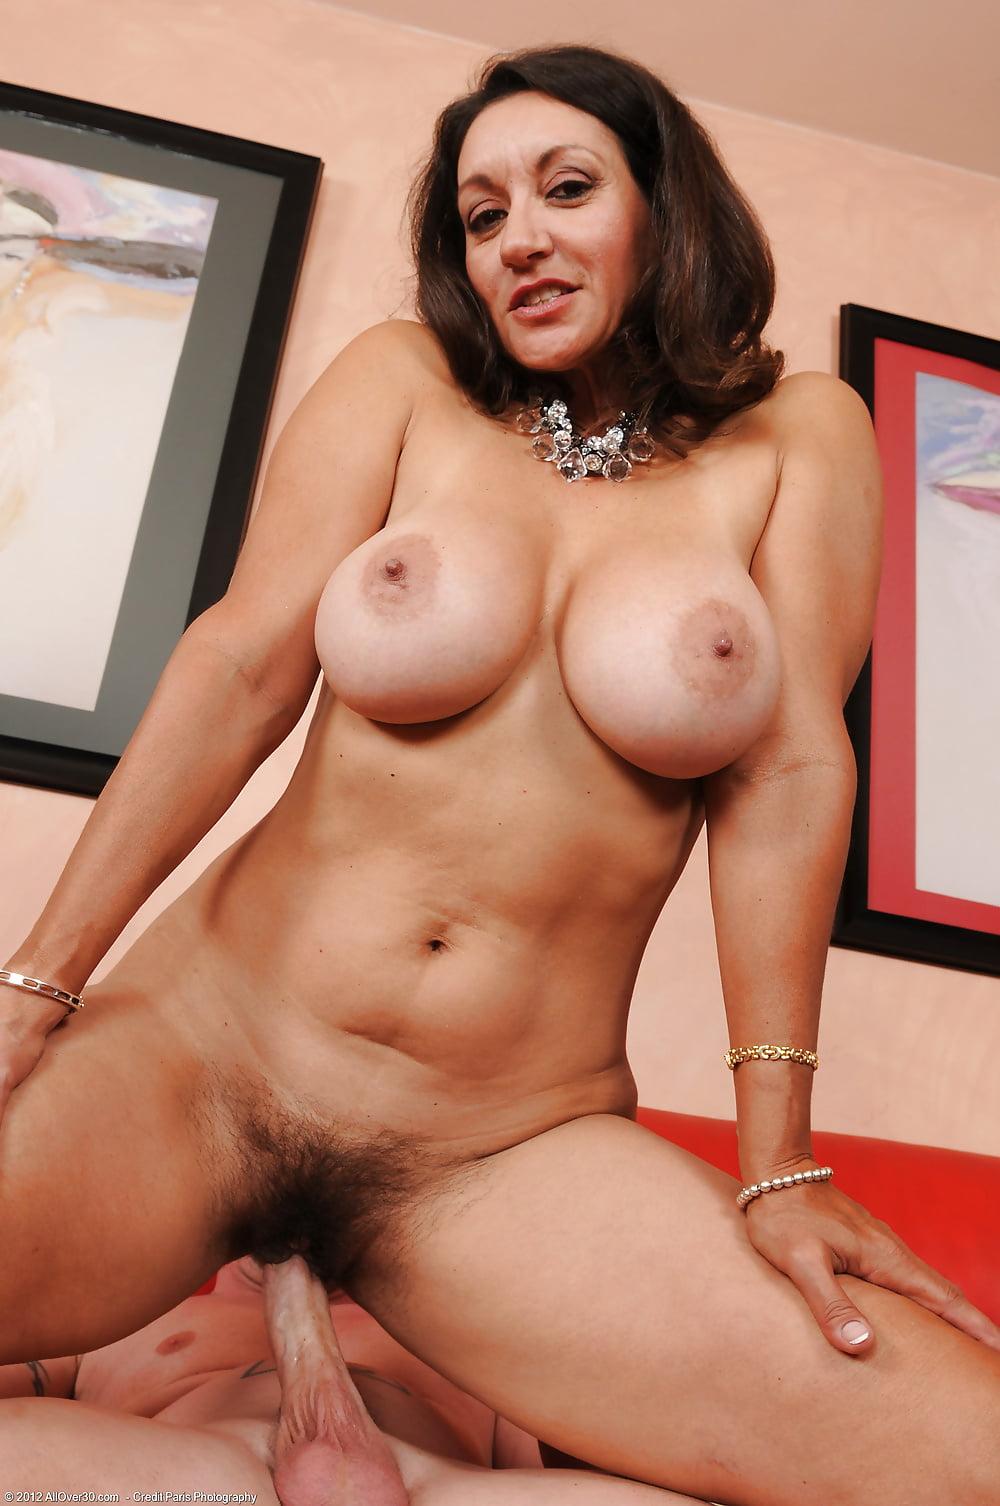 BBW Shemale Porn Pics